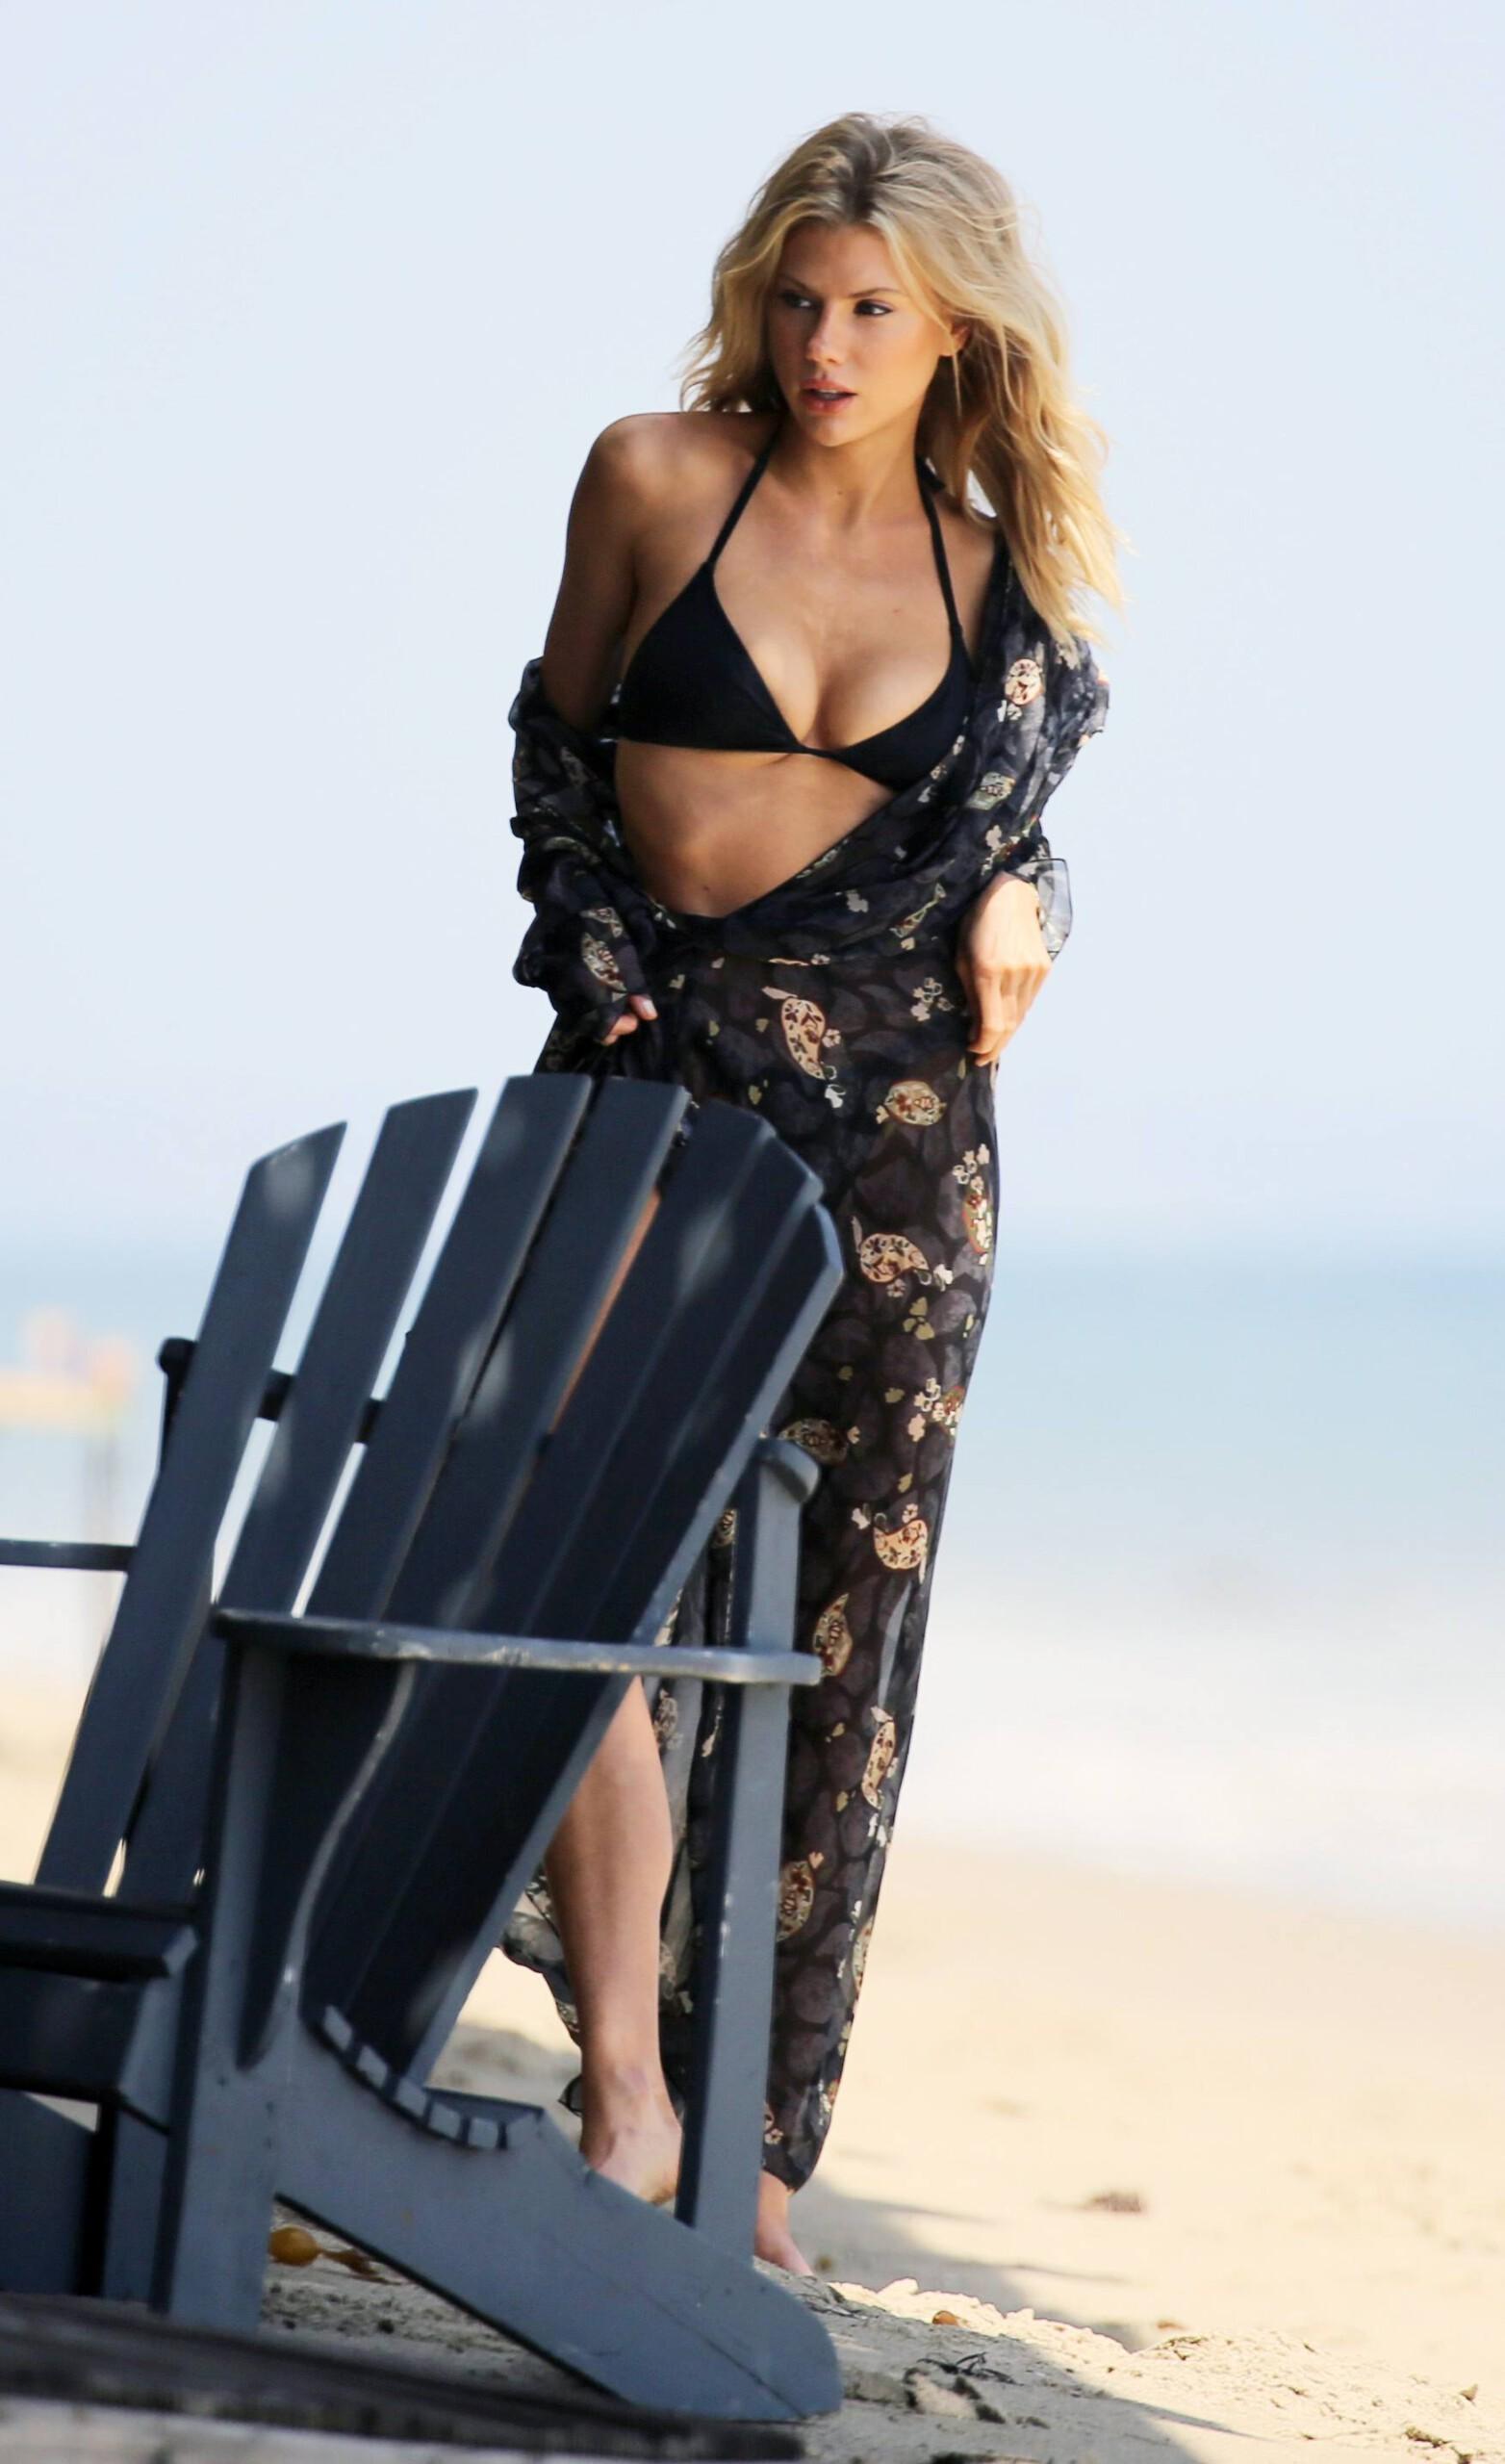 Charlotte Mckinney – Sexy Boobs In Tiny Bikini On The Beach In Los Angeles 0014